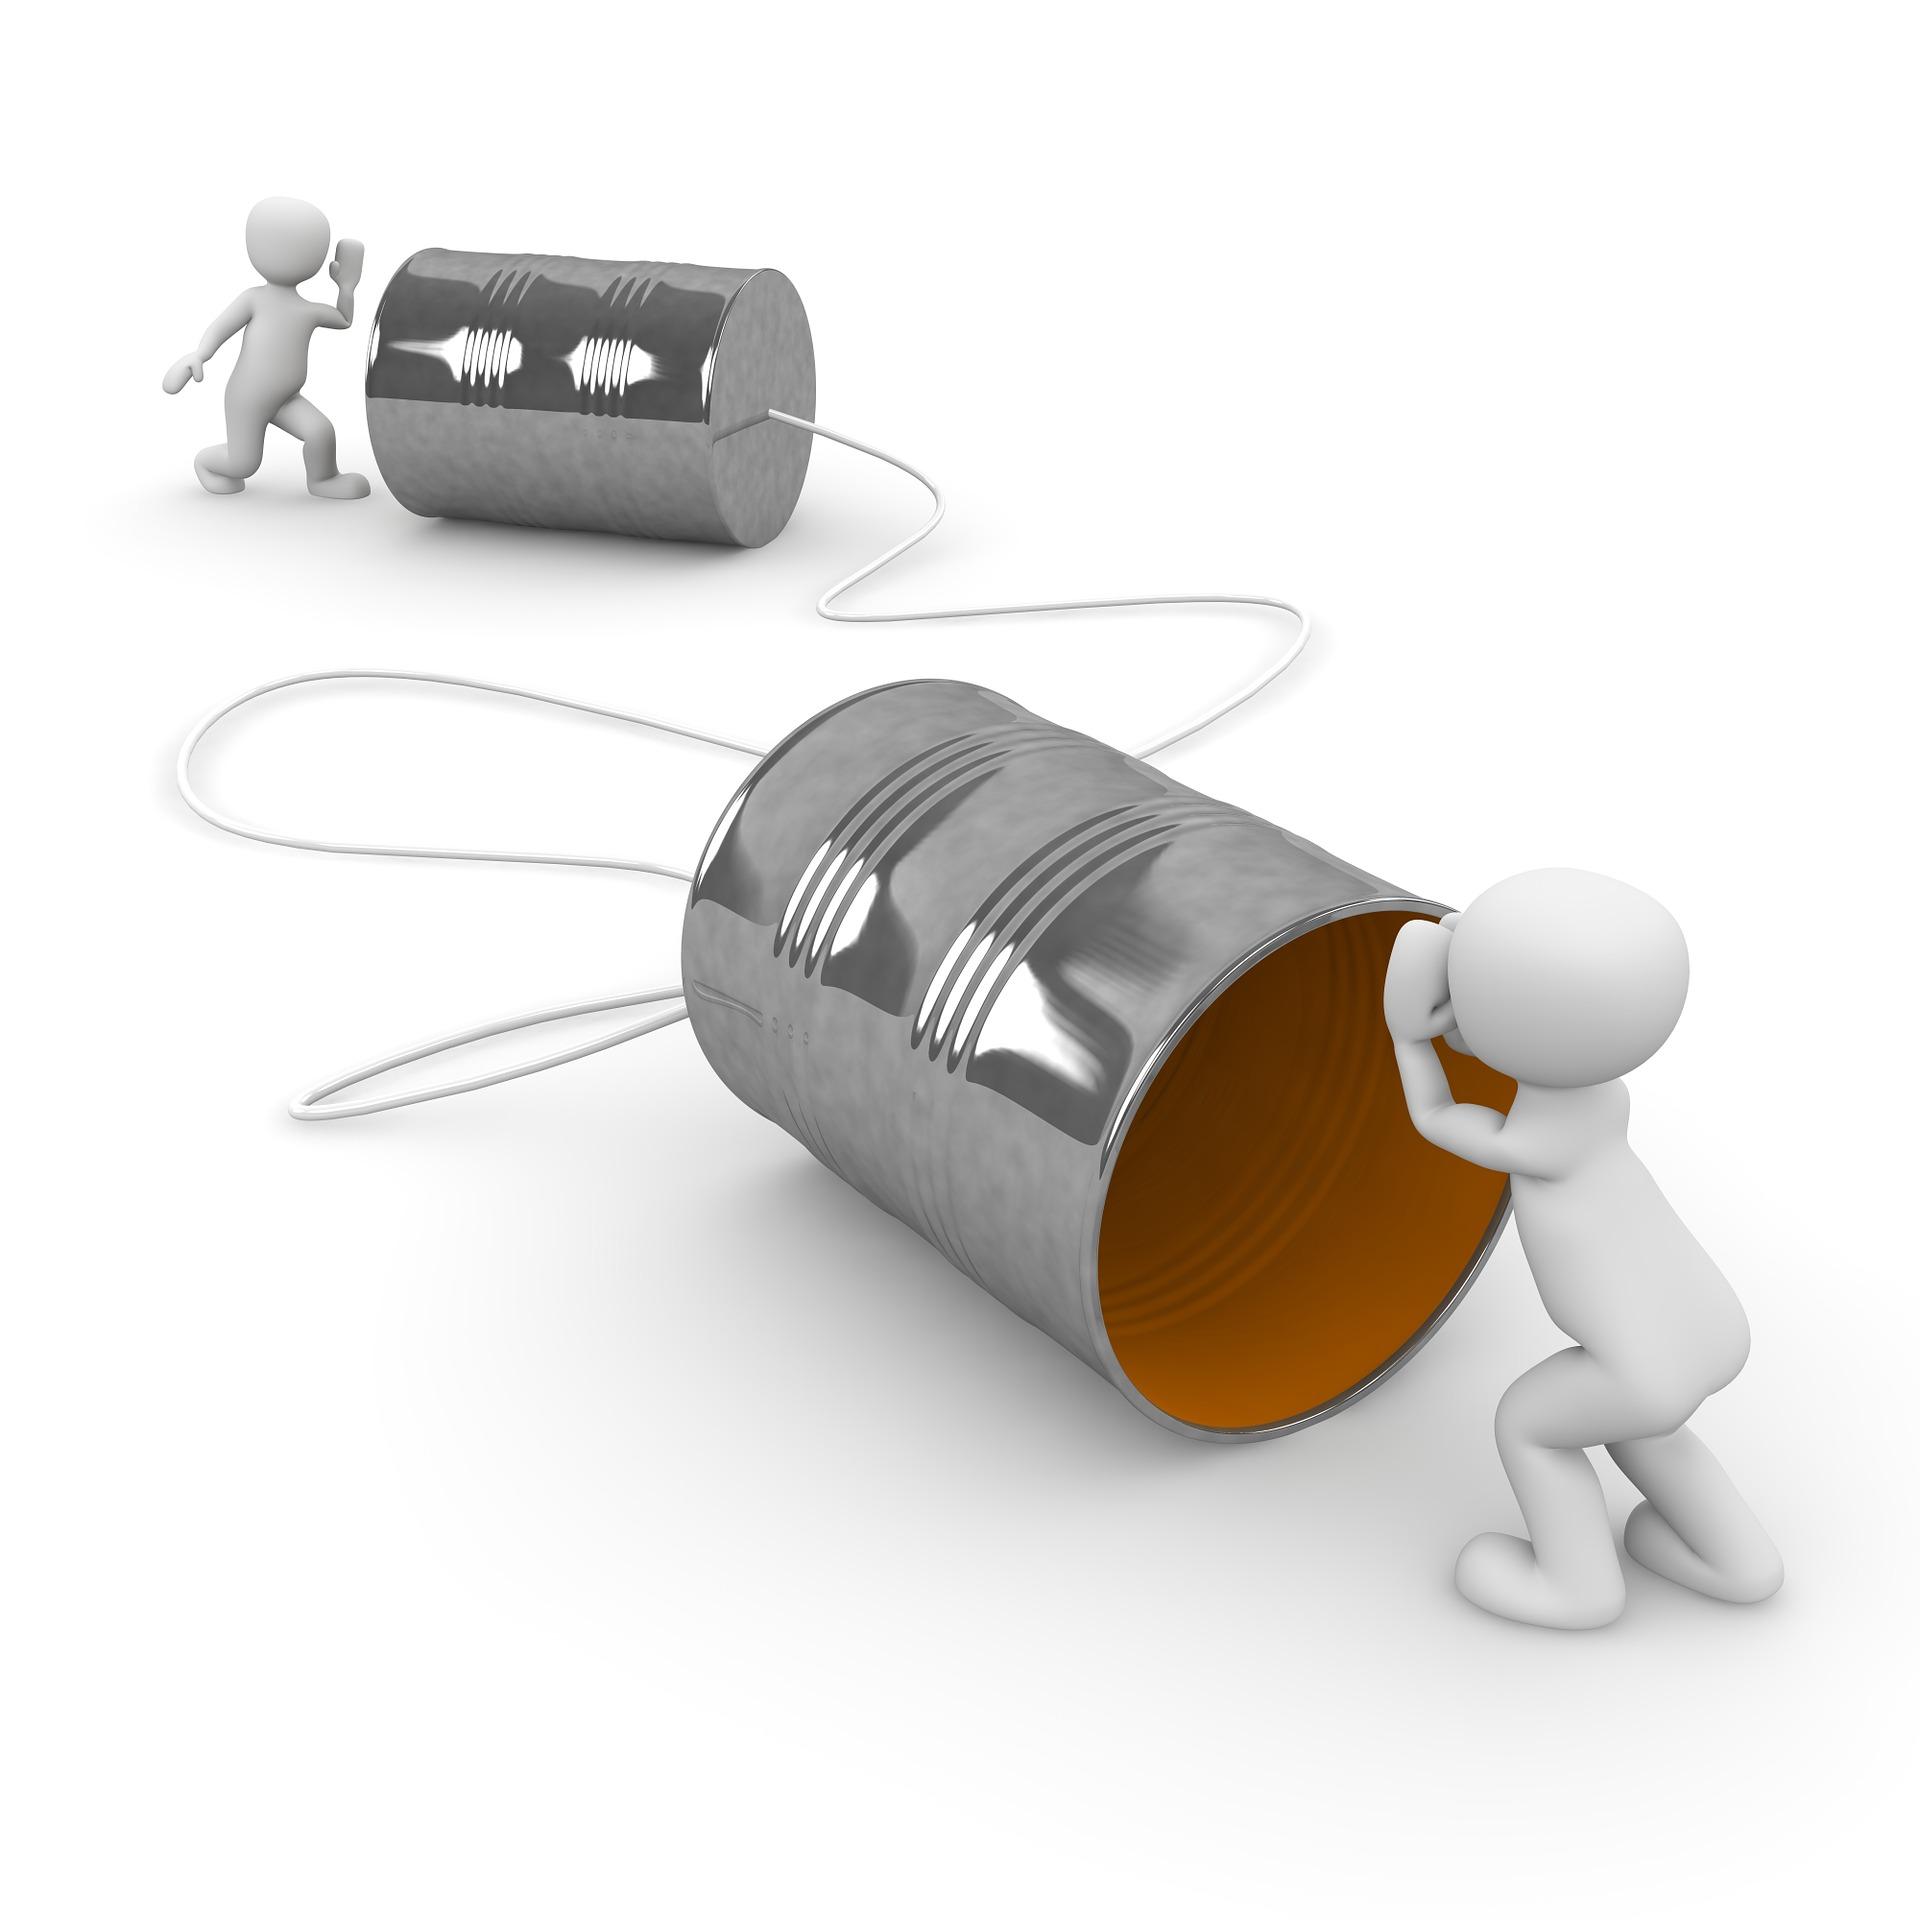 Liability MSA (LMSA) and No-Fault MSA (NFMSA), Medicare Secondary Payer Compliance, MSP